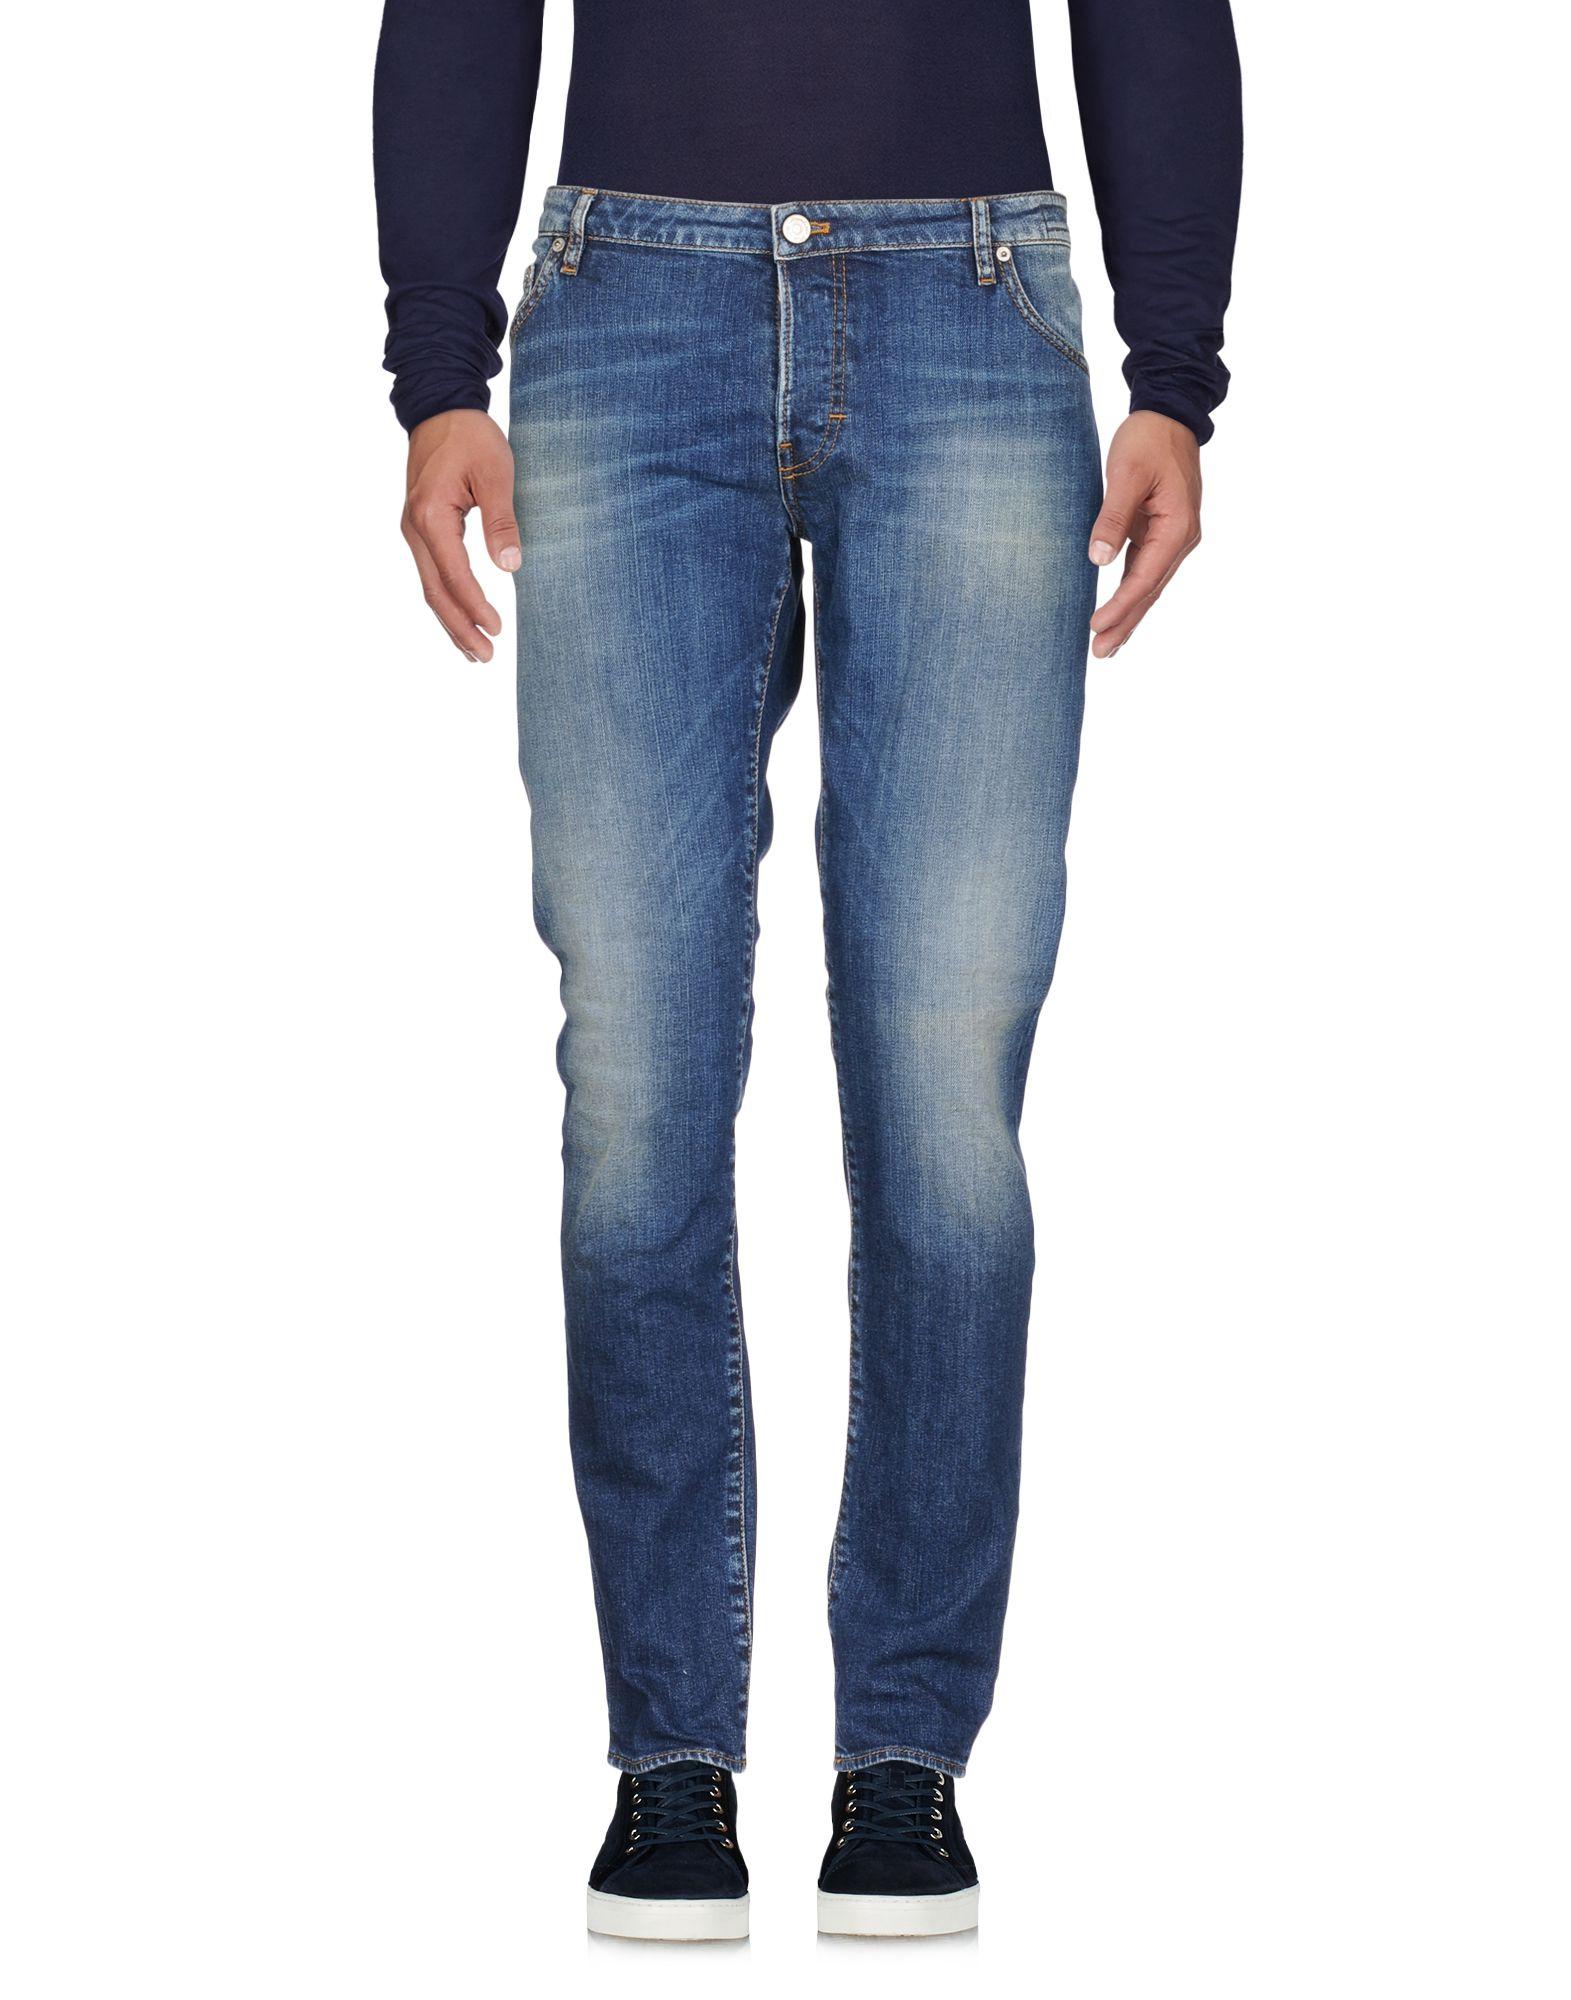 Pantaloni Jeans Pt05 Uomo - - Uomo 42683305VC 8eae2c